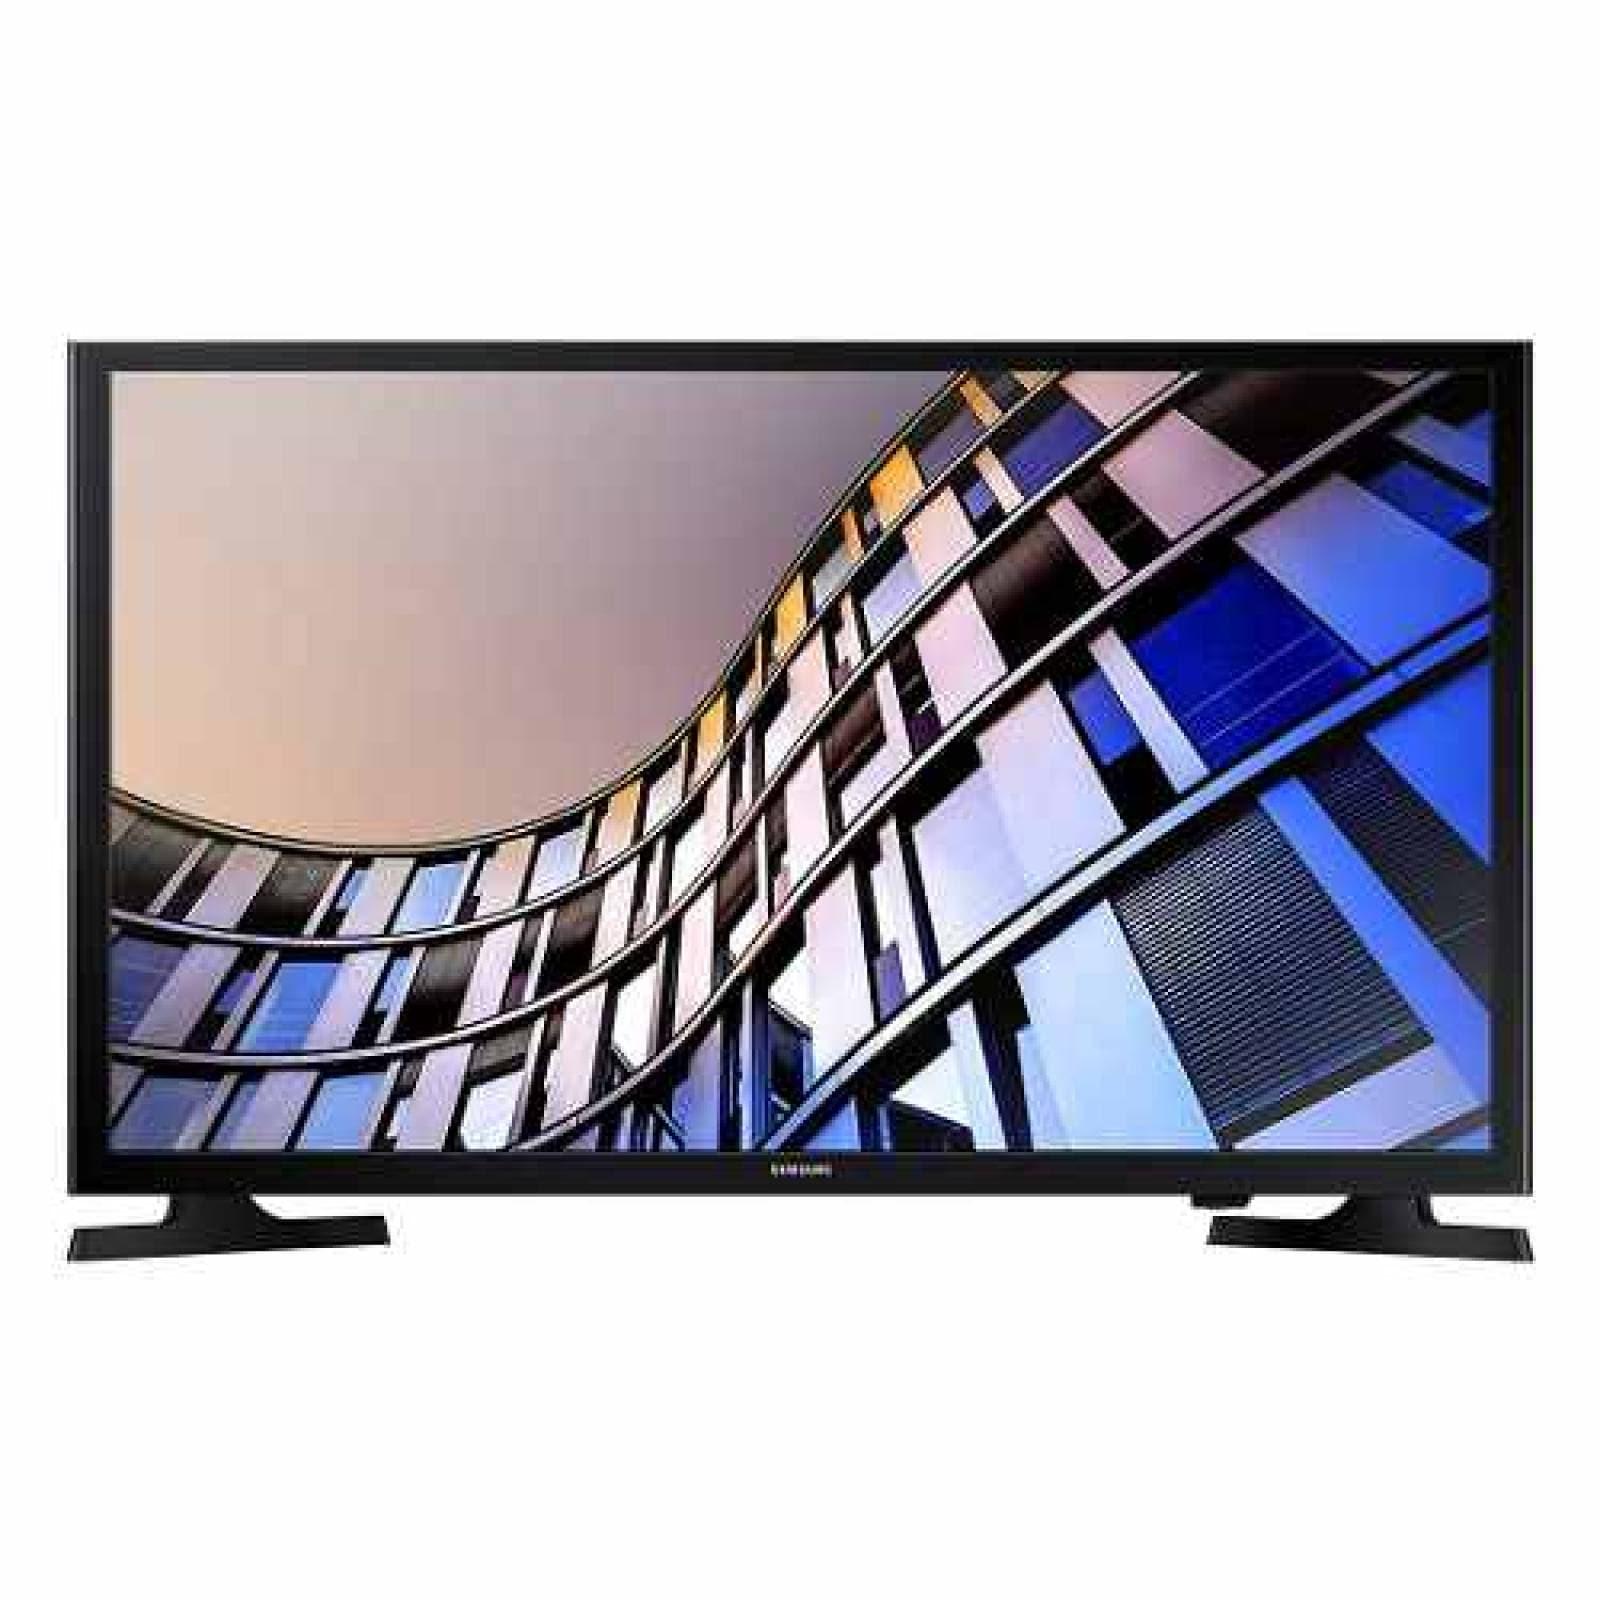 Pantalla Smart Tv 32 Pulgadas Led Hd Un32m4500afxza Samsung